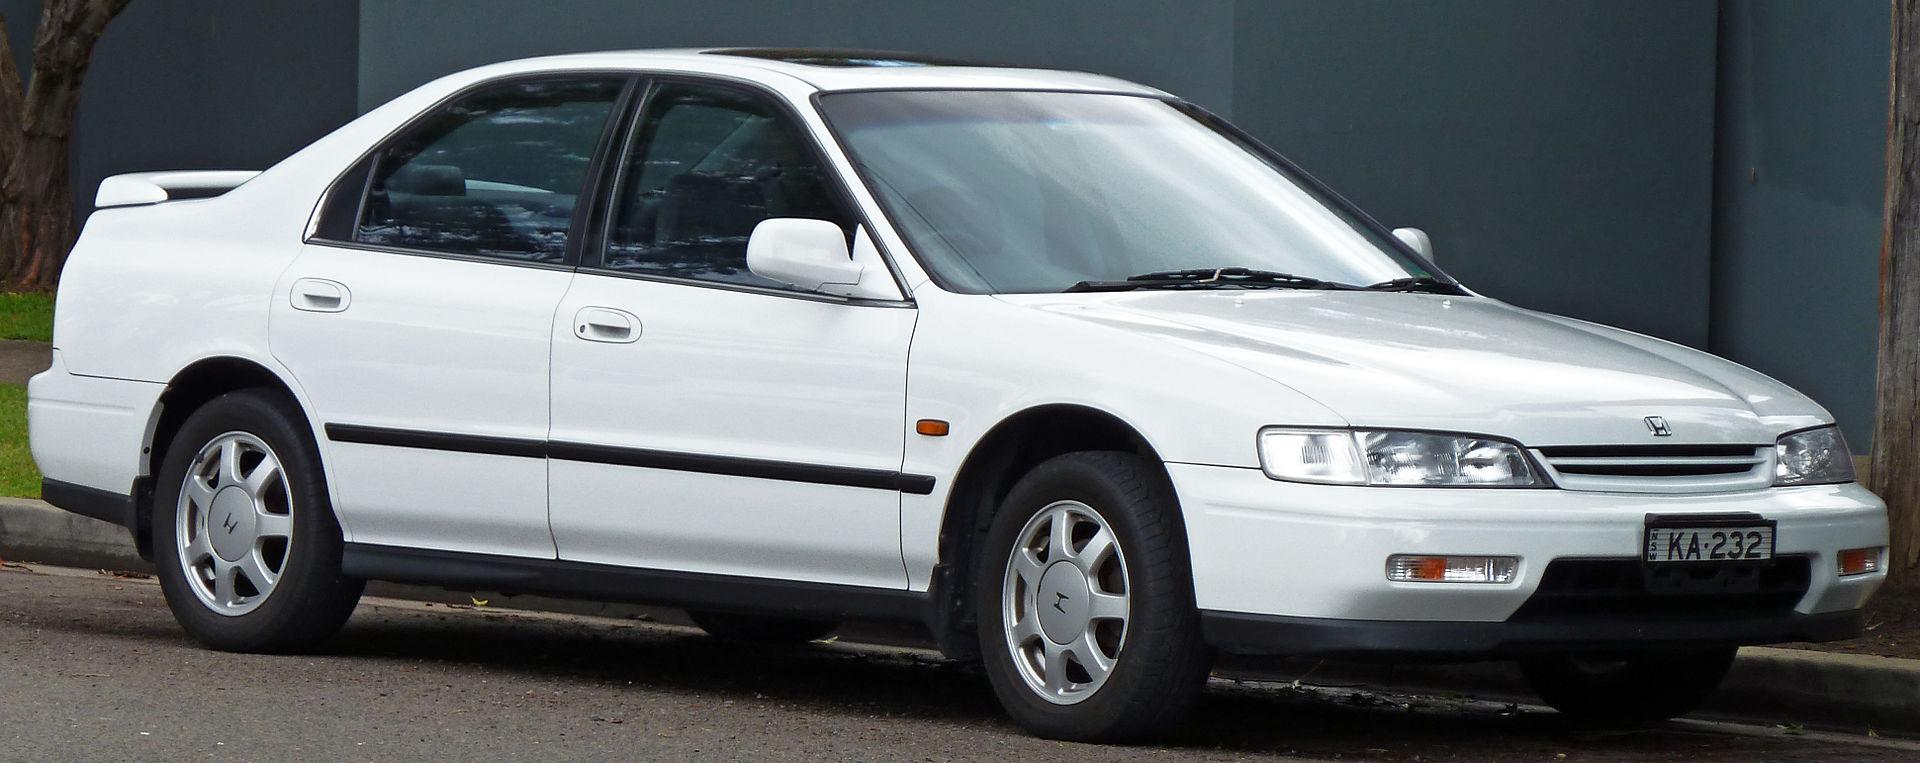 Evolution Of Some Popular Japanese And Korean Vehicle Models Mitsubishi Diamante Timing Belt Moreover Wiring Diagram On Mekecom 1993 1995